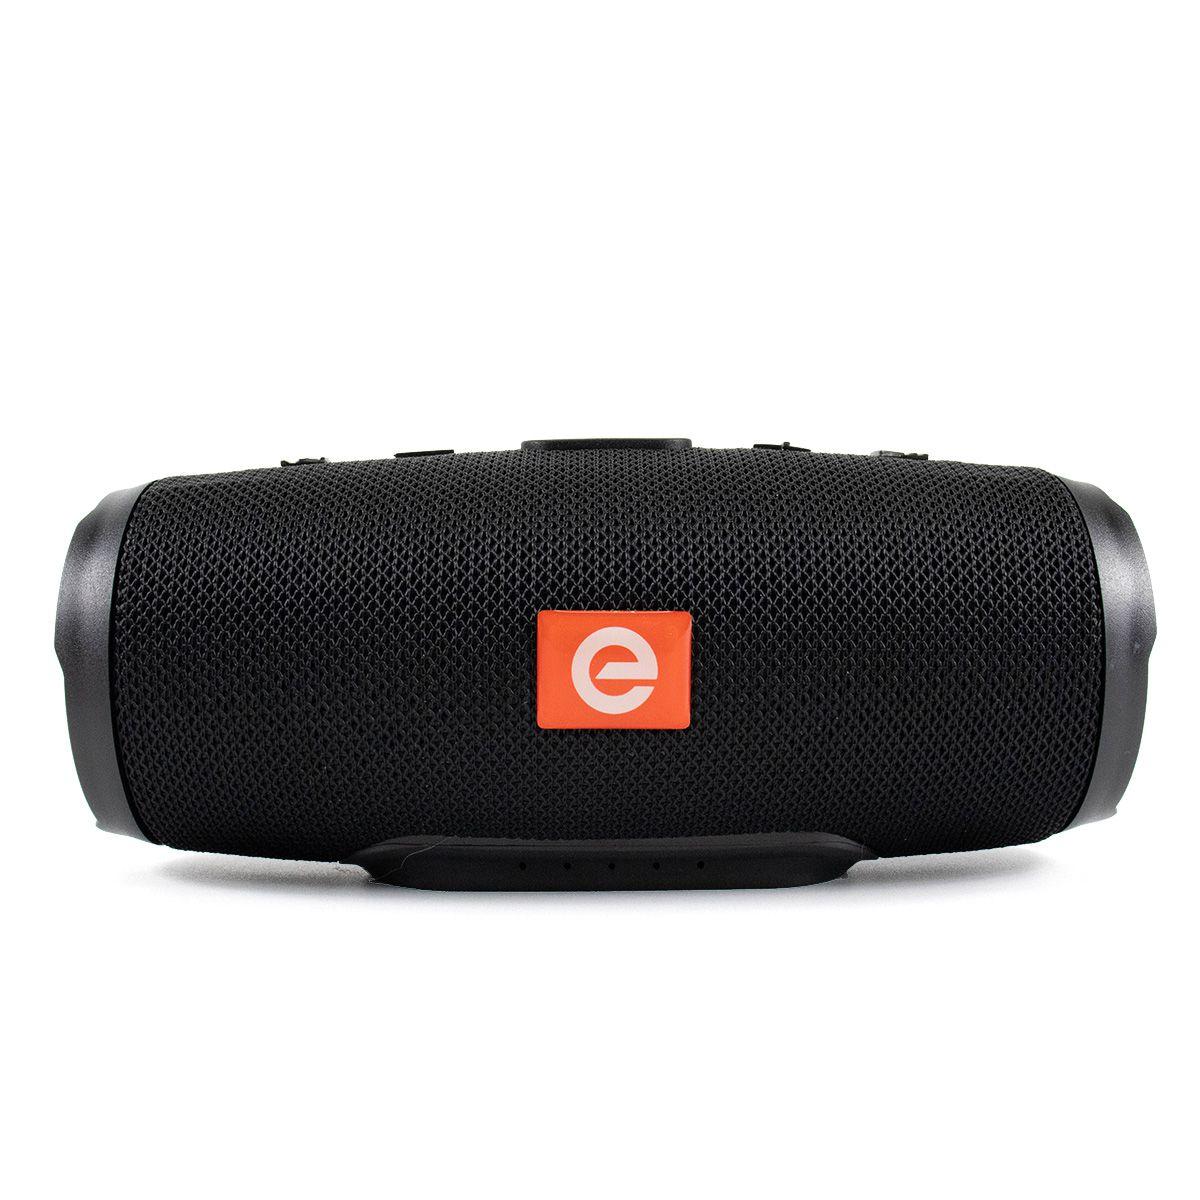 Caixa de Som Bluetooth Portátil Multimídia 6 Watts Rms Exbom CS-M35BT